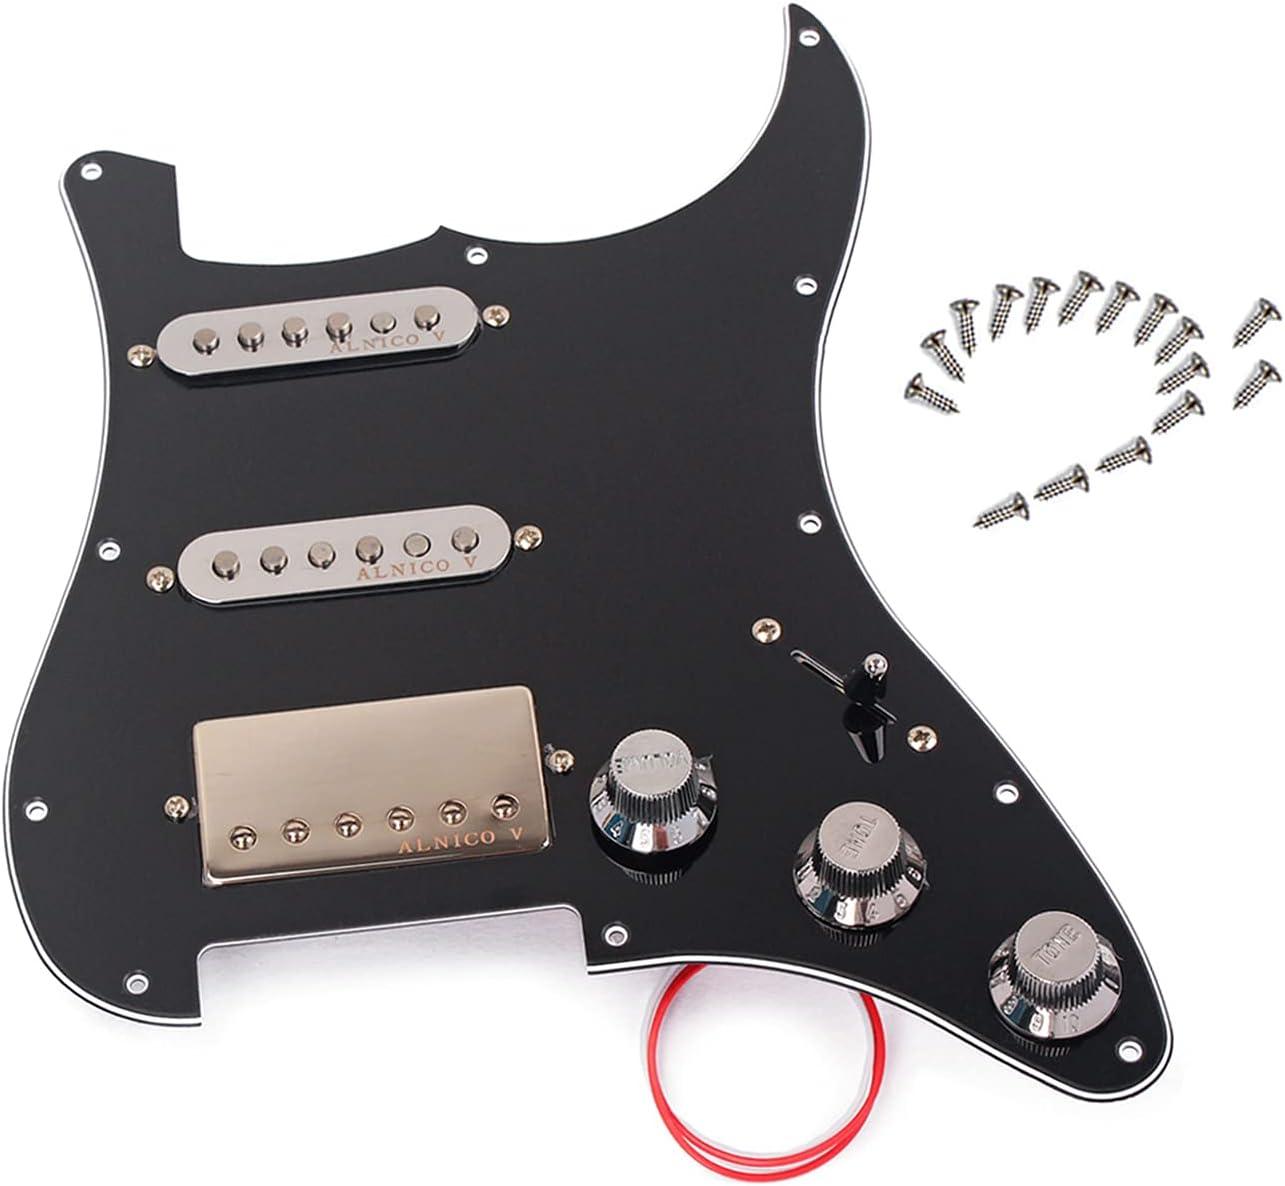 LAMSAM Prewired Strat Pickguard with 3-ply Set SSH 商店 当店限定販売 Pick Pickup